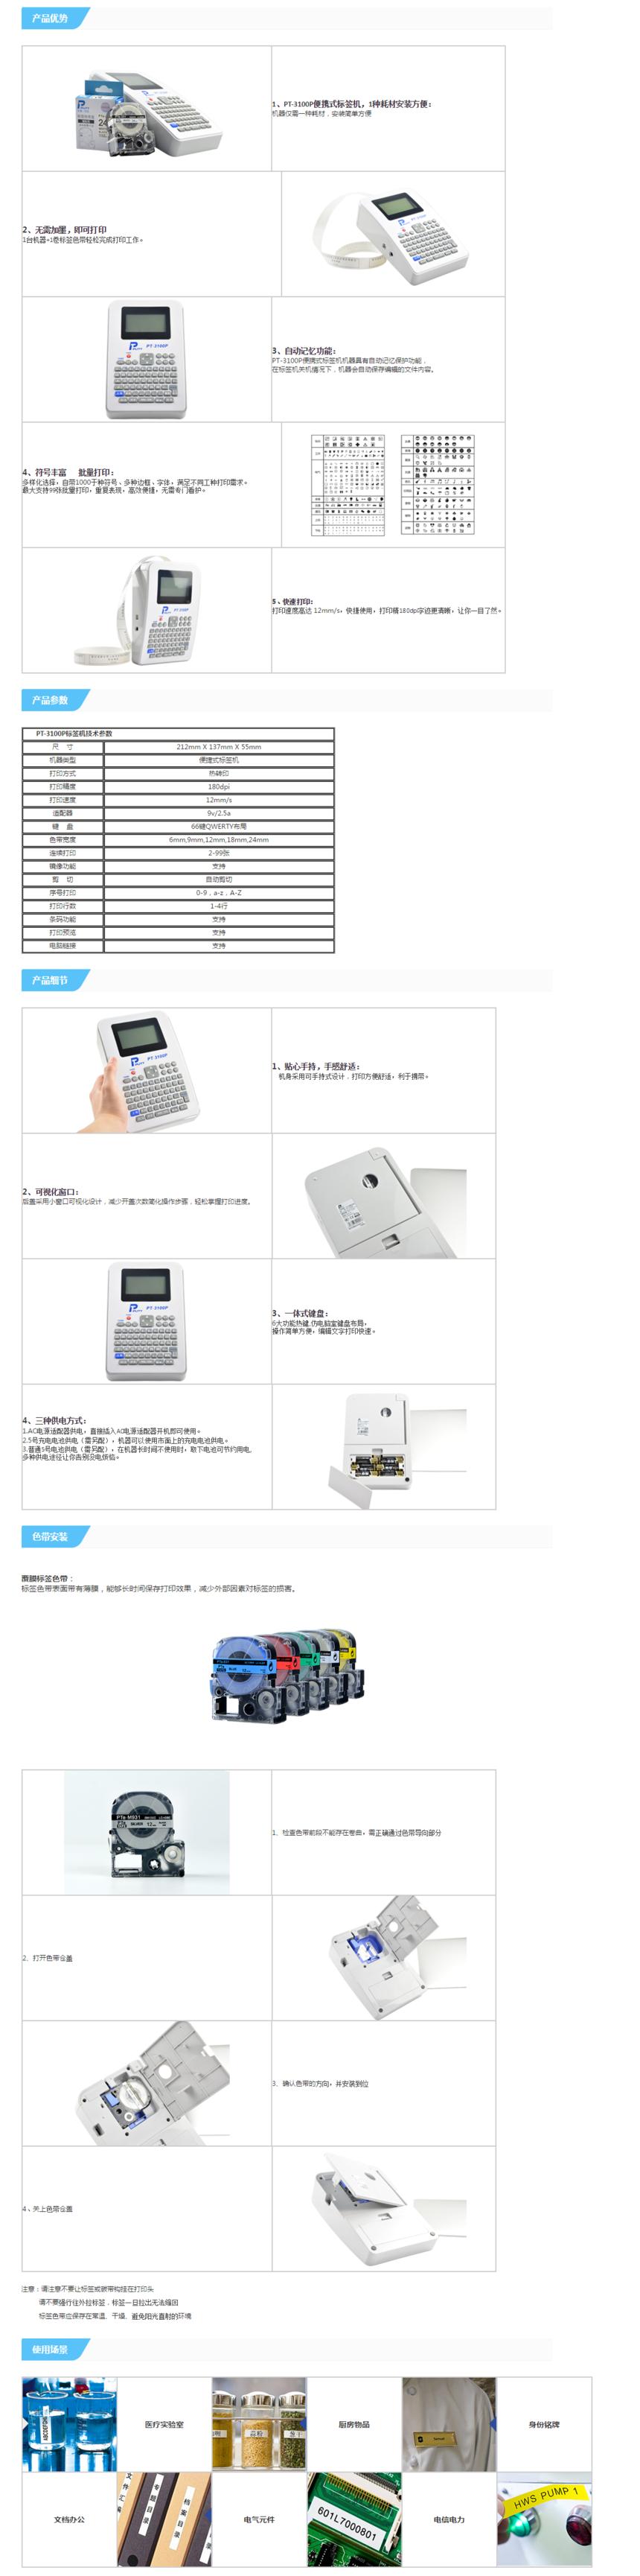 PT-3100P便携式标签机_普贴科技PUTY官方网站.png